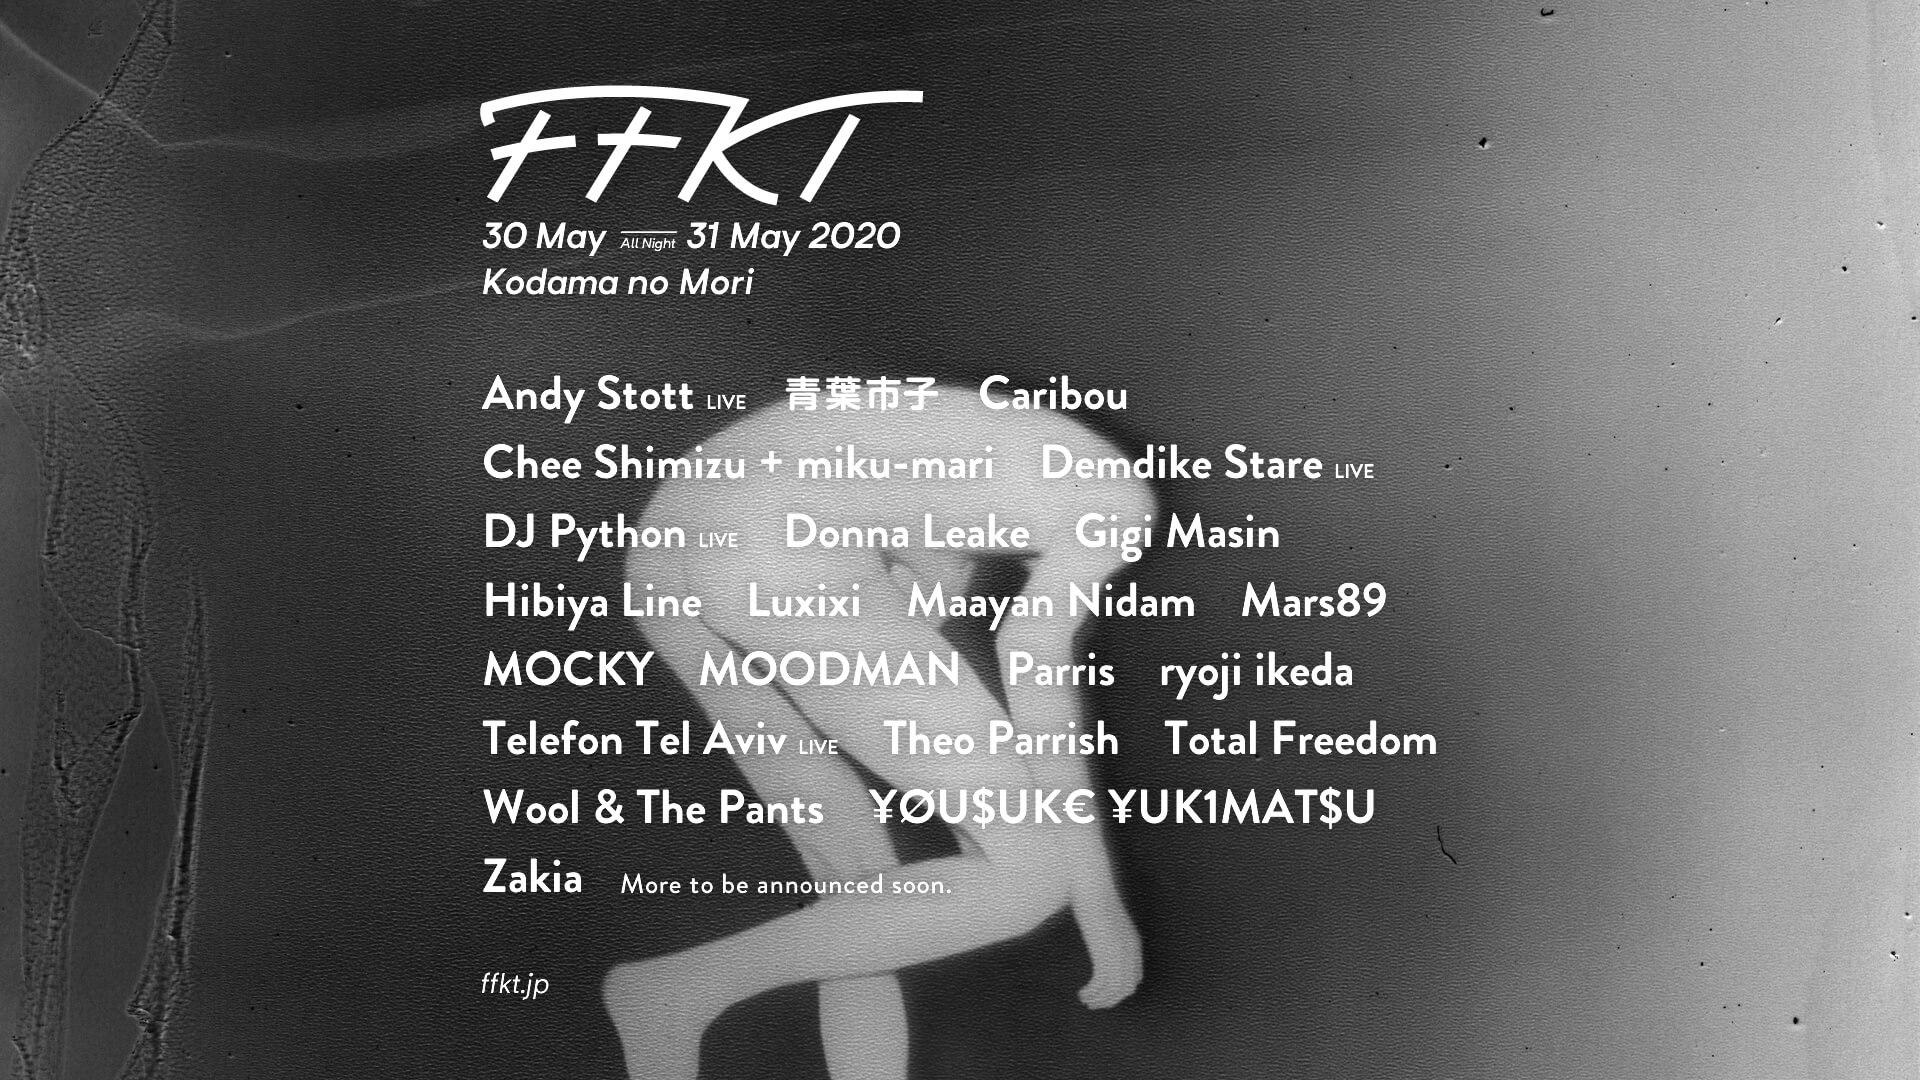 <FFKT 2020>の1stラインナップが発表!Theo Parrish、Caribou、Donna Leake、ryoji ikedaら music200214_ffkt_1